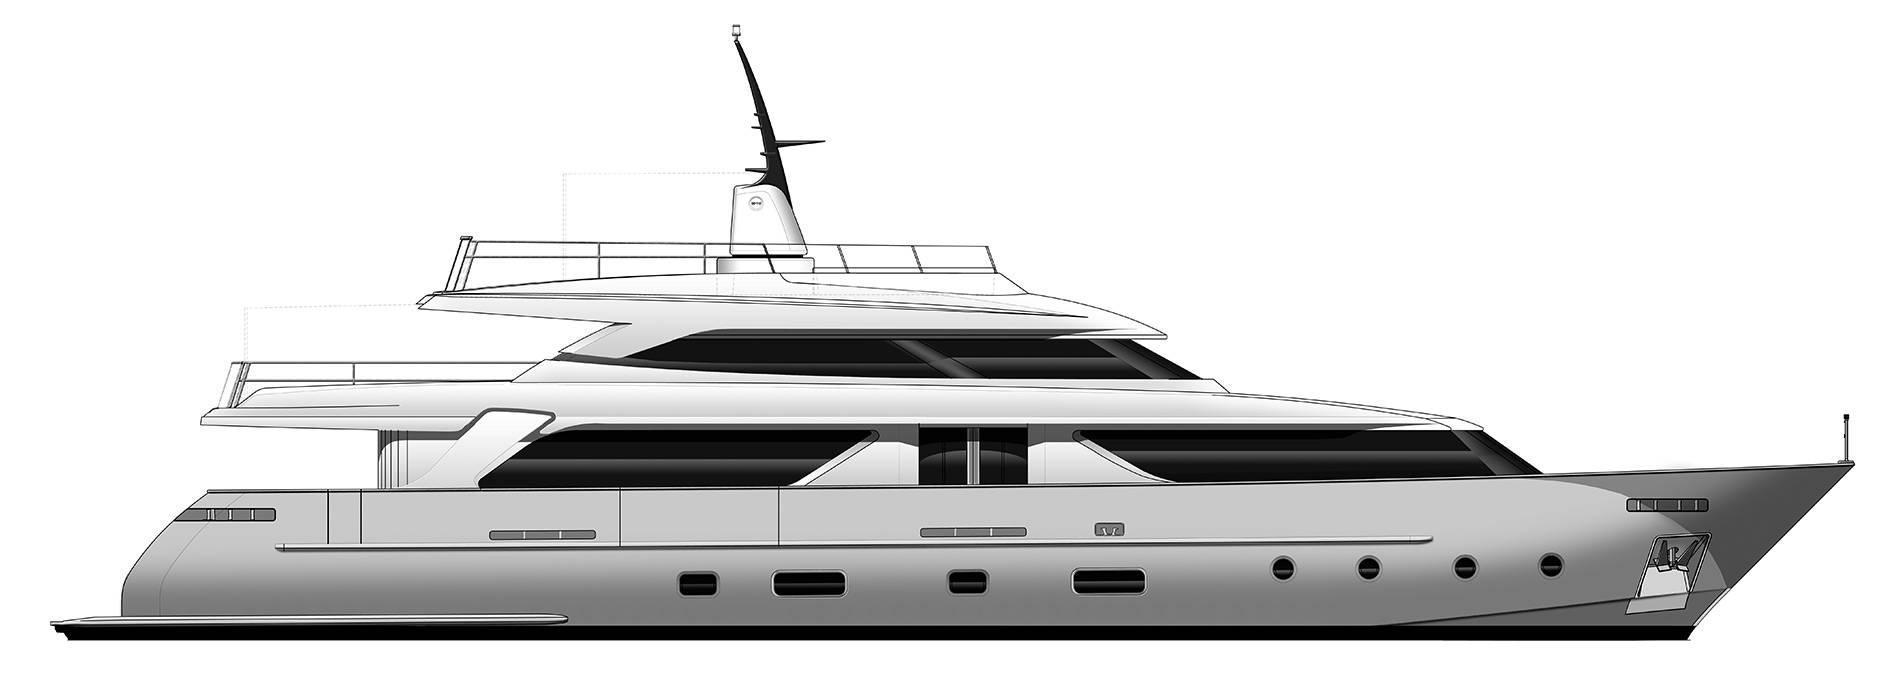 Sanlorenzo Yachts SD112 Profile